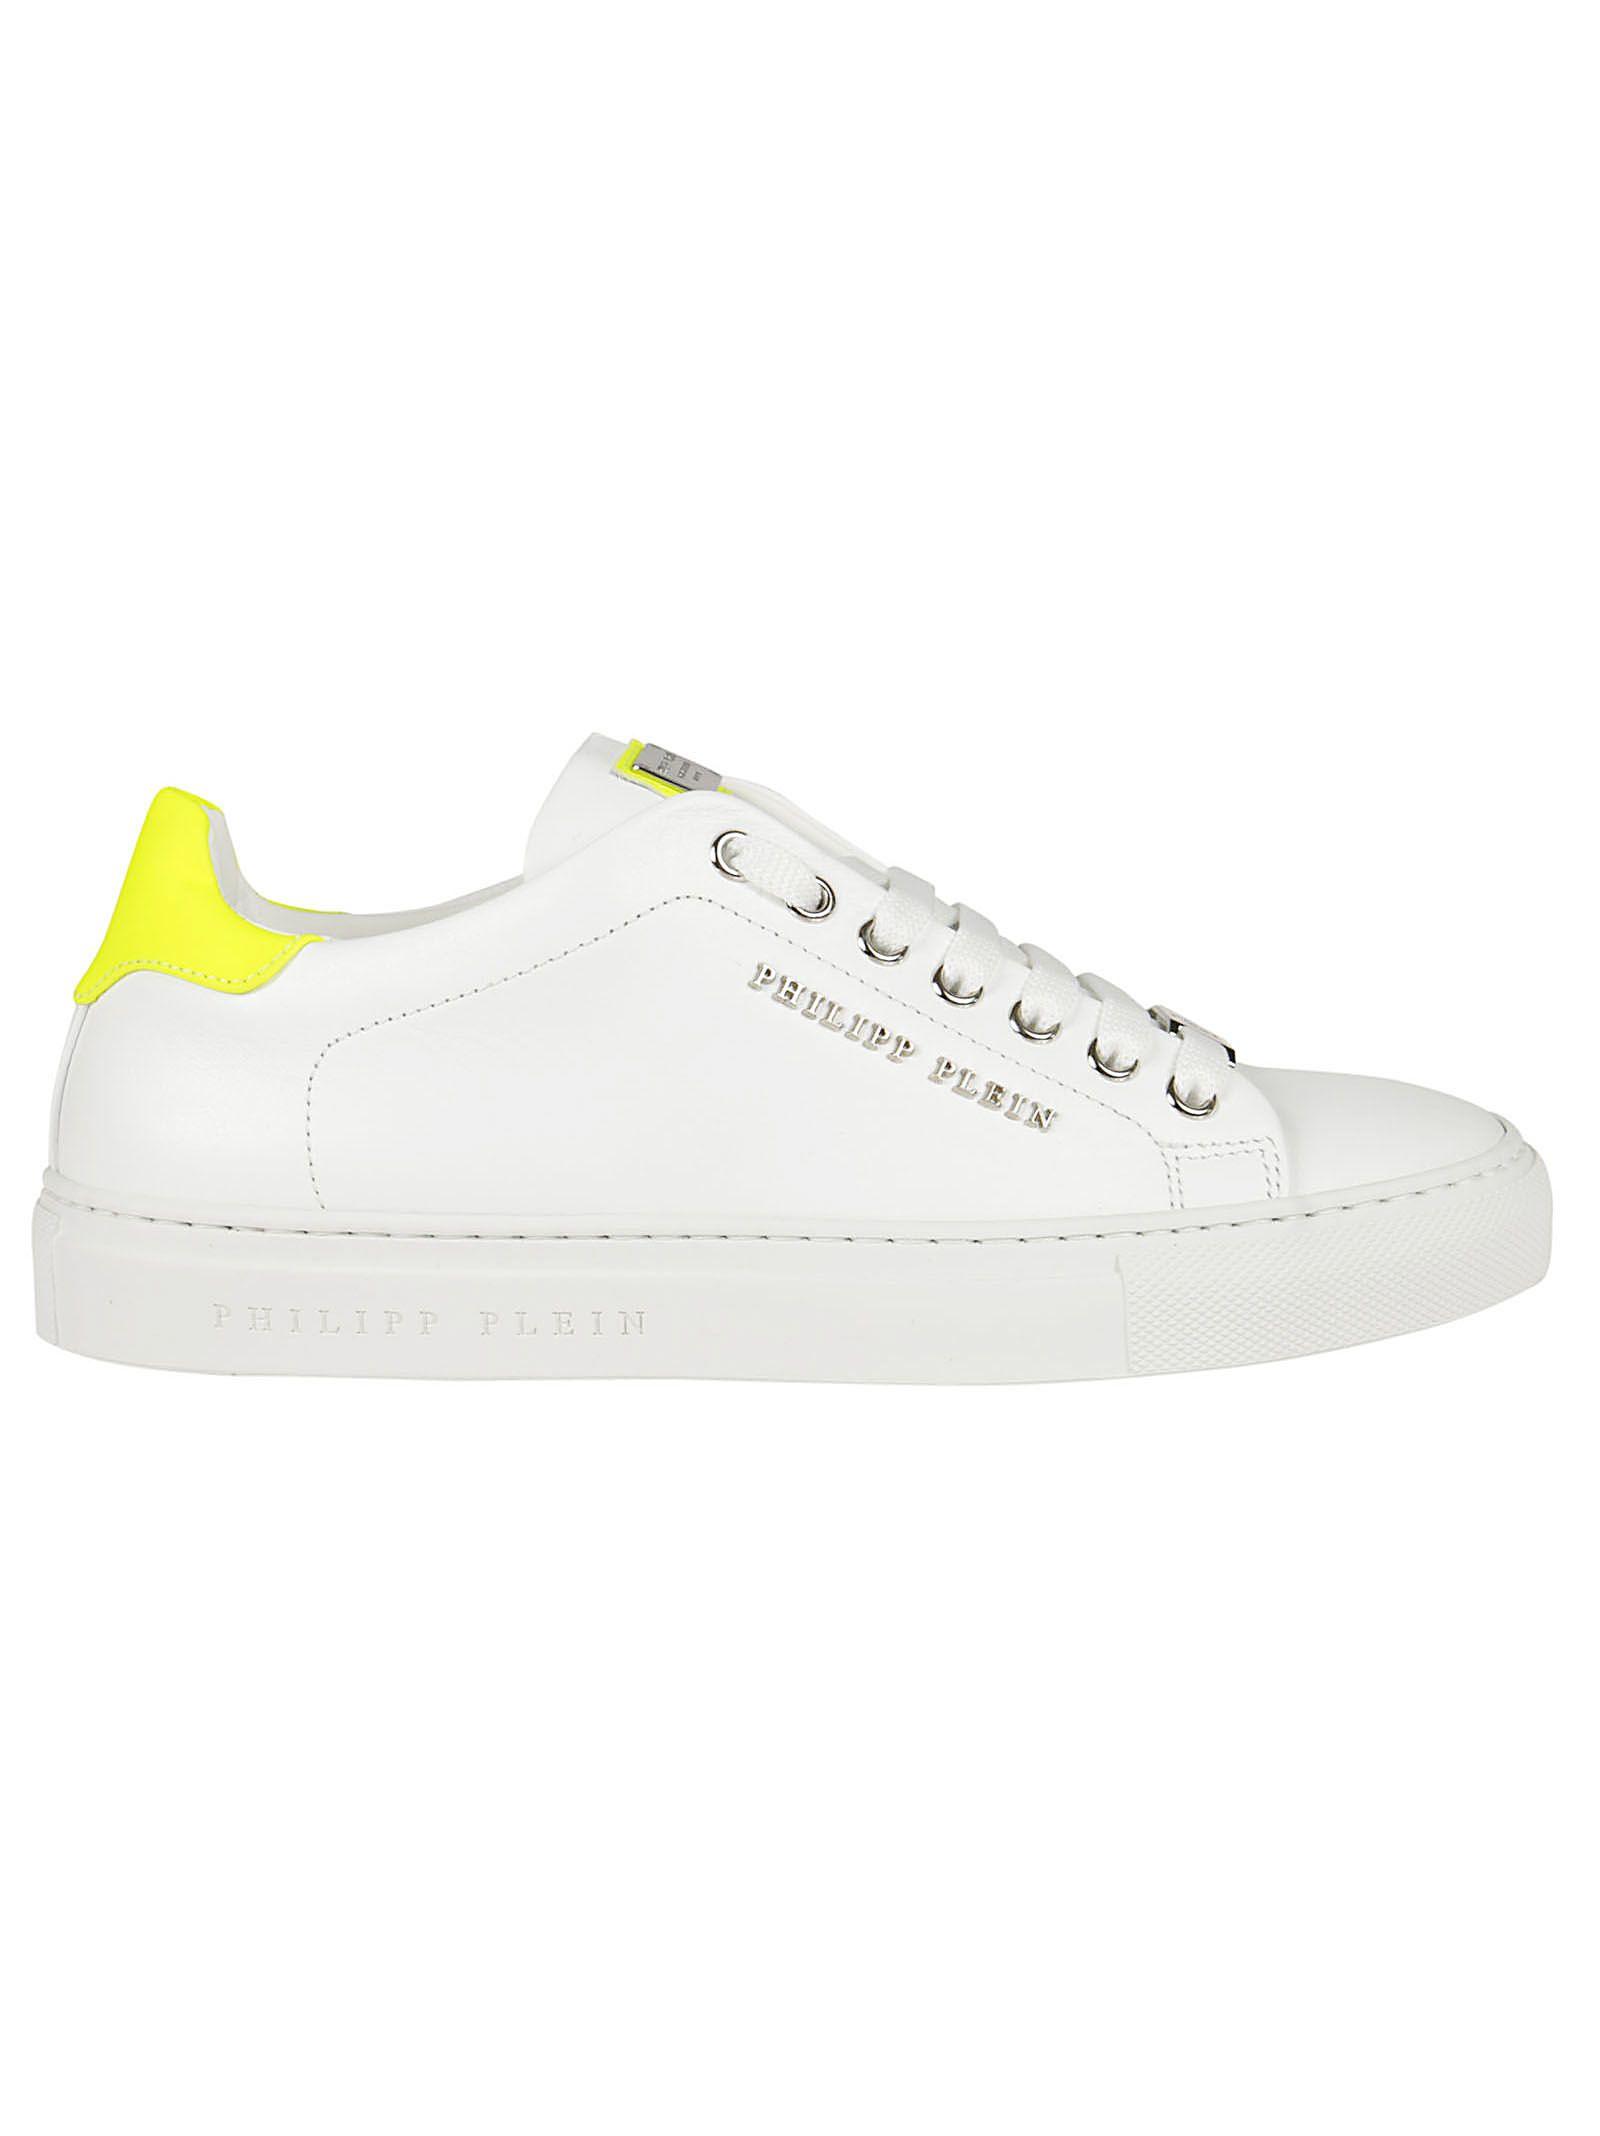 Philipp Plein Classic Sneakers